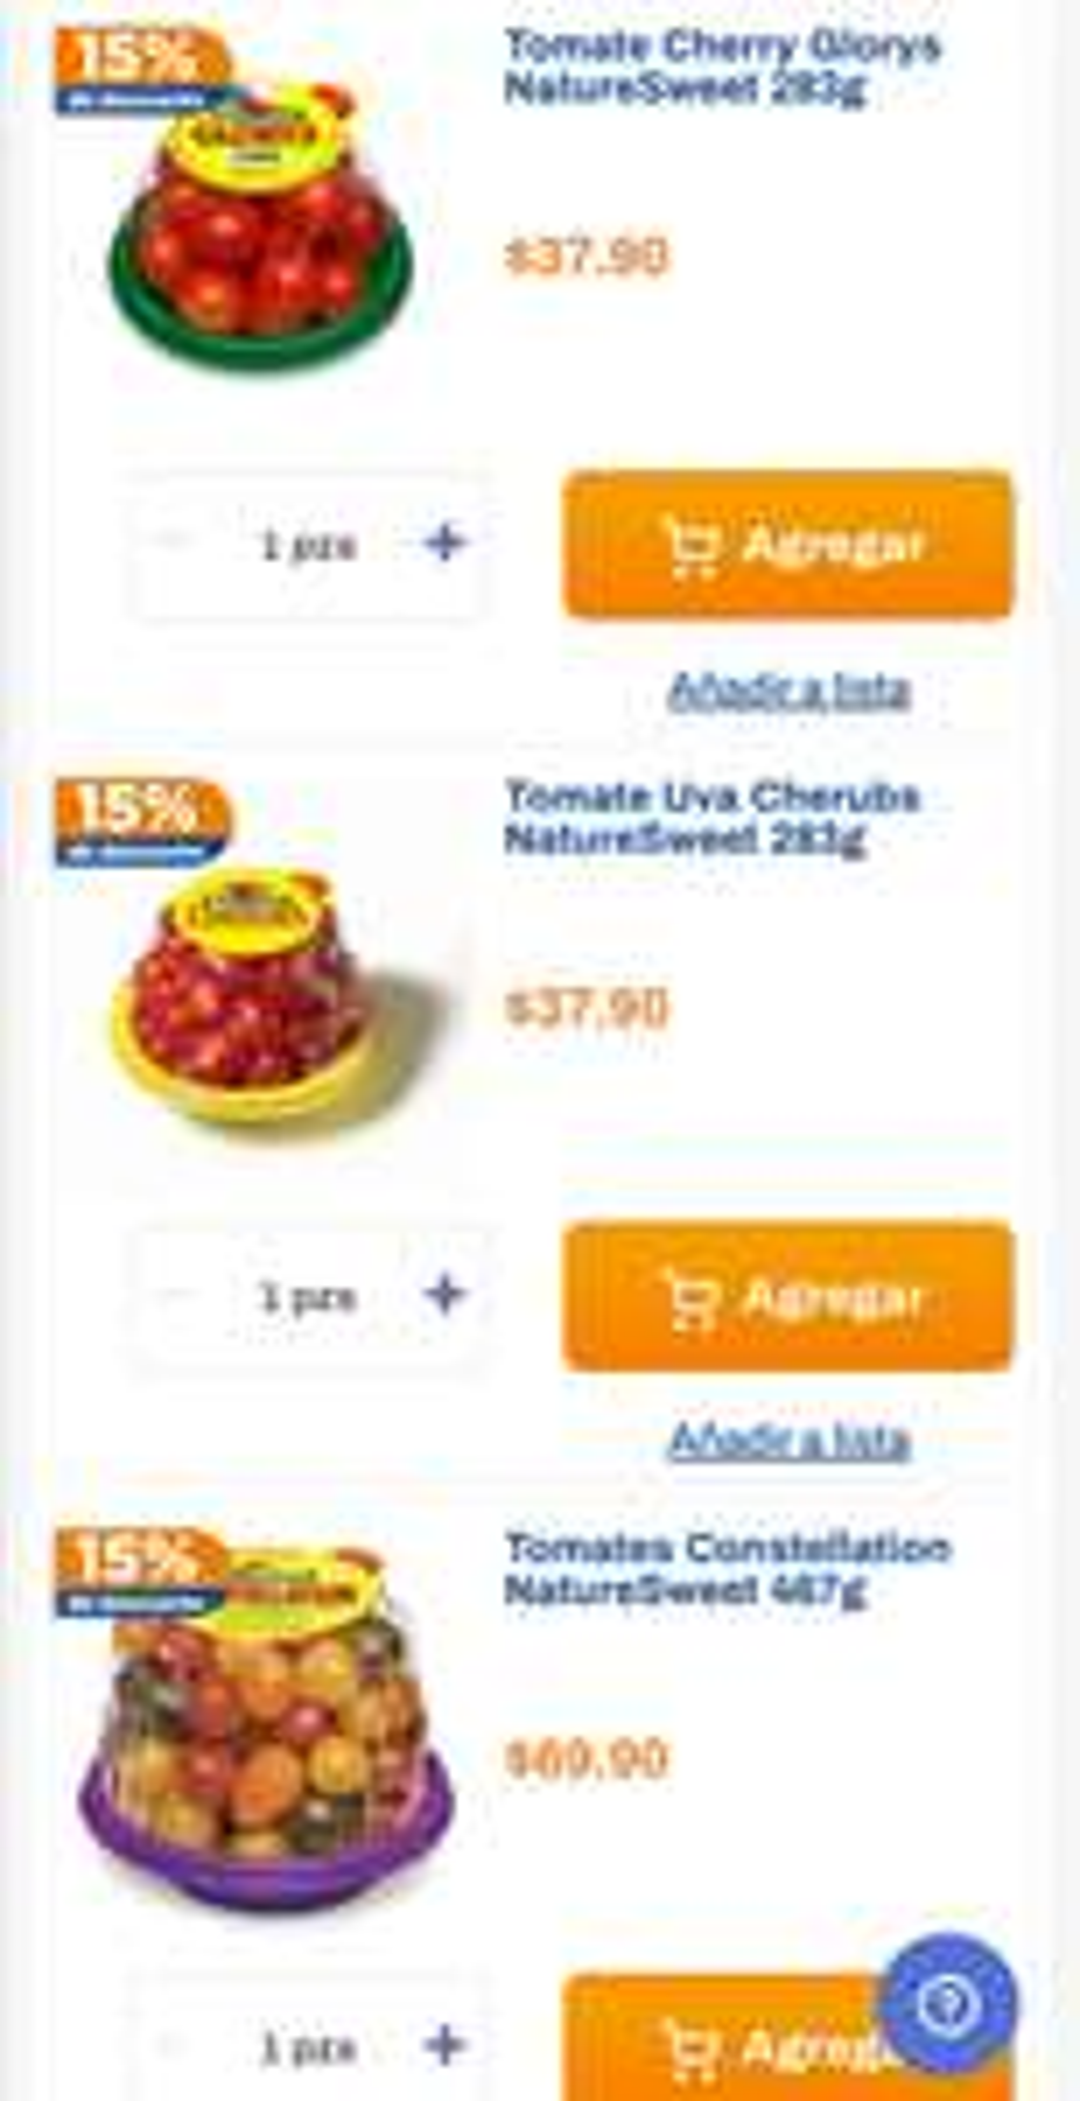 Chedraui: 15% de descuento en tomatitos empacados Nature Sweet